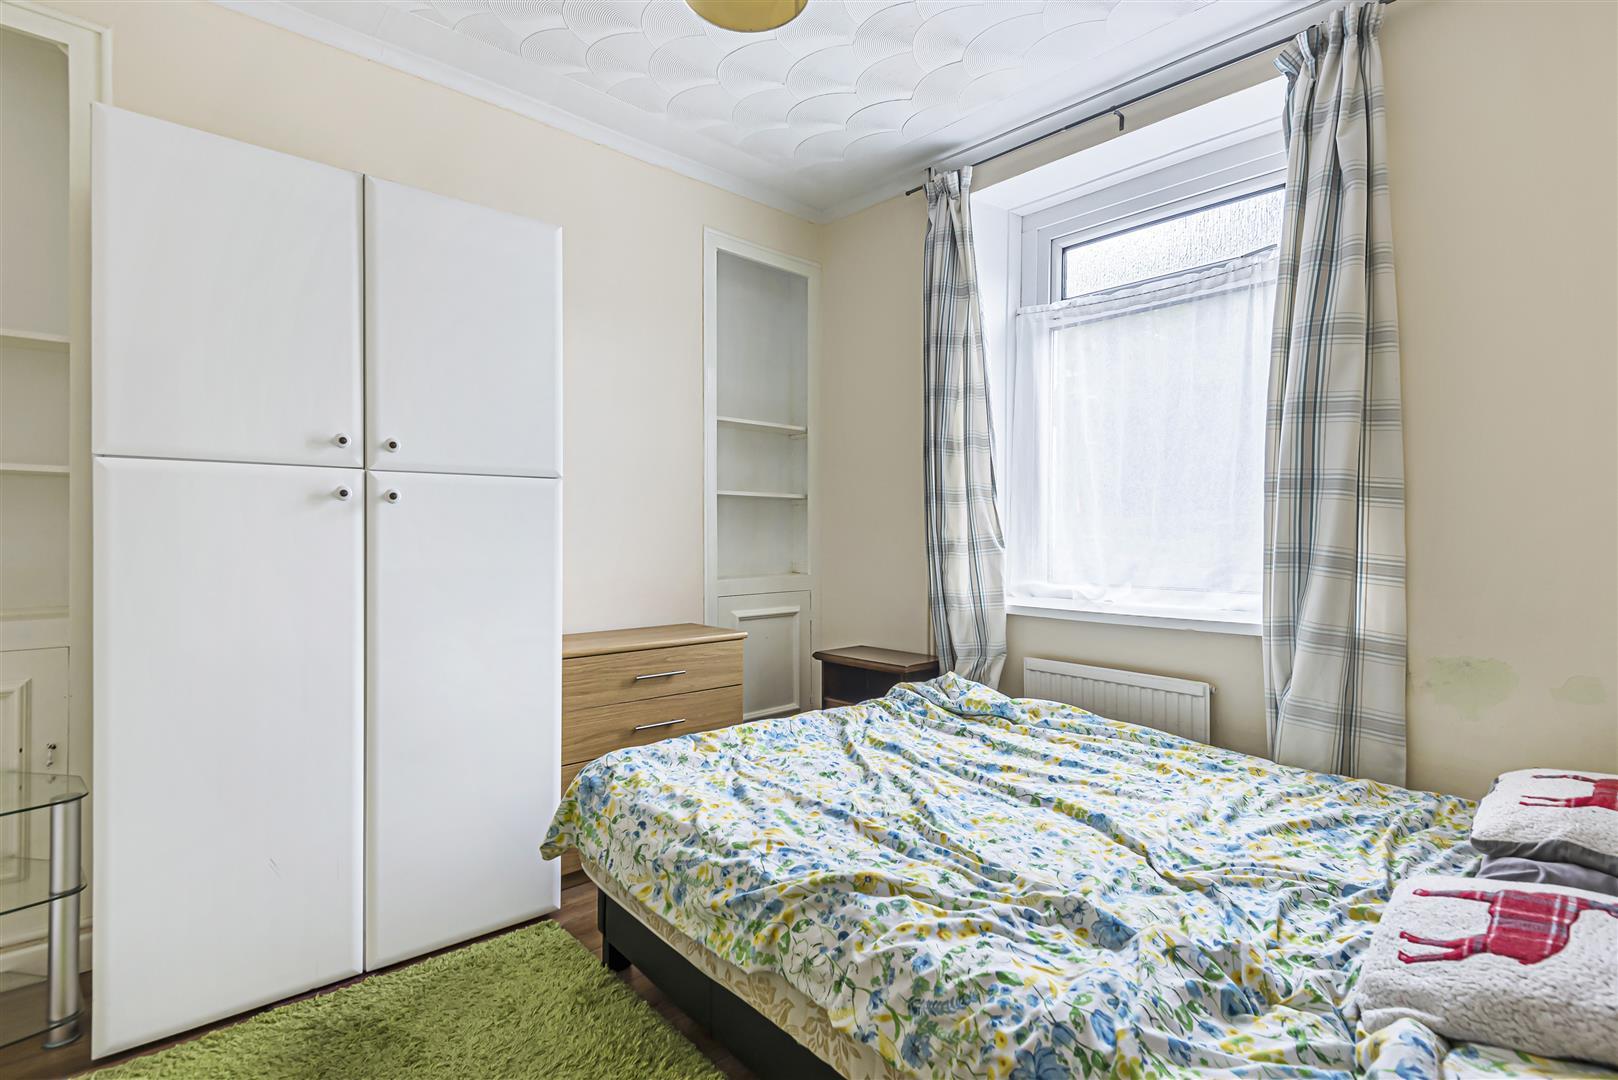 Peniel Green Road, Llansamlet, Swansea, SA7 9AU